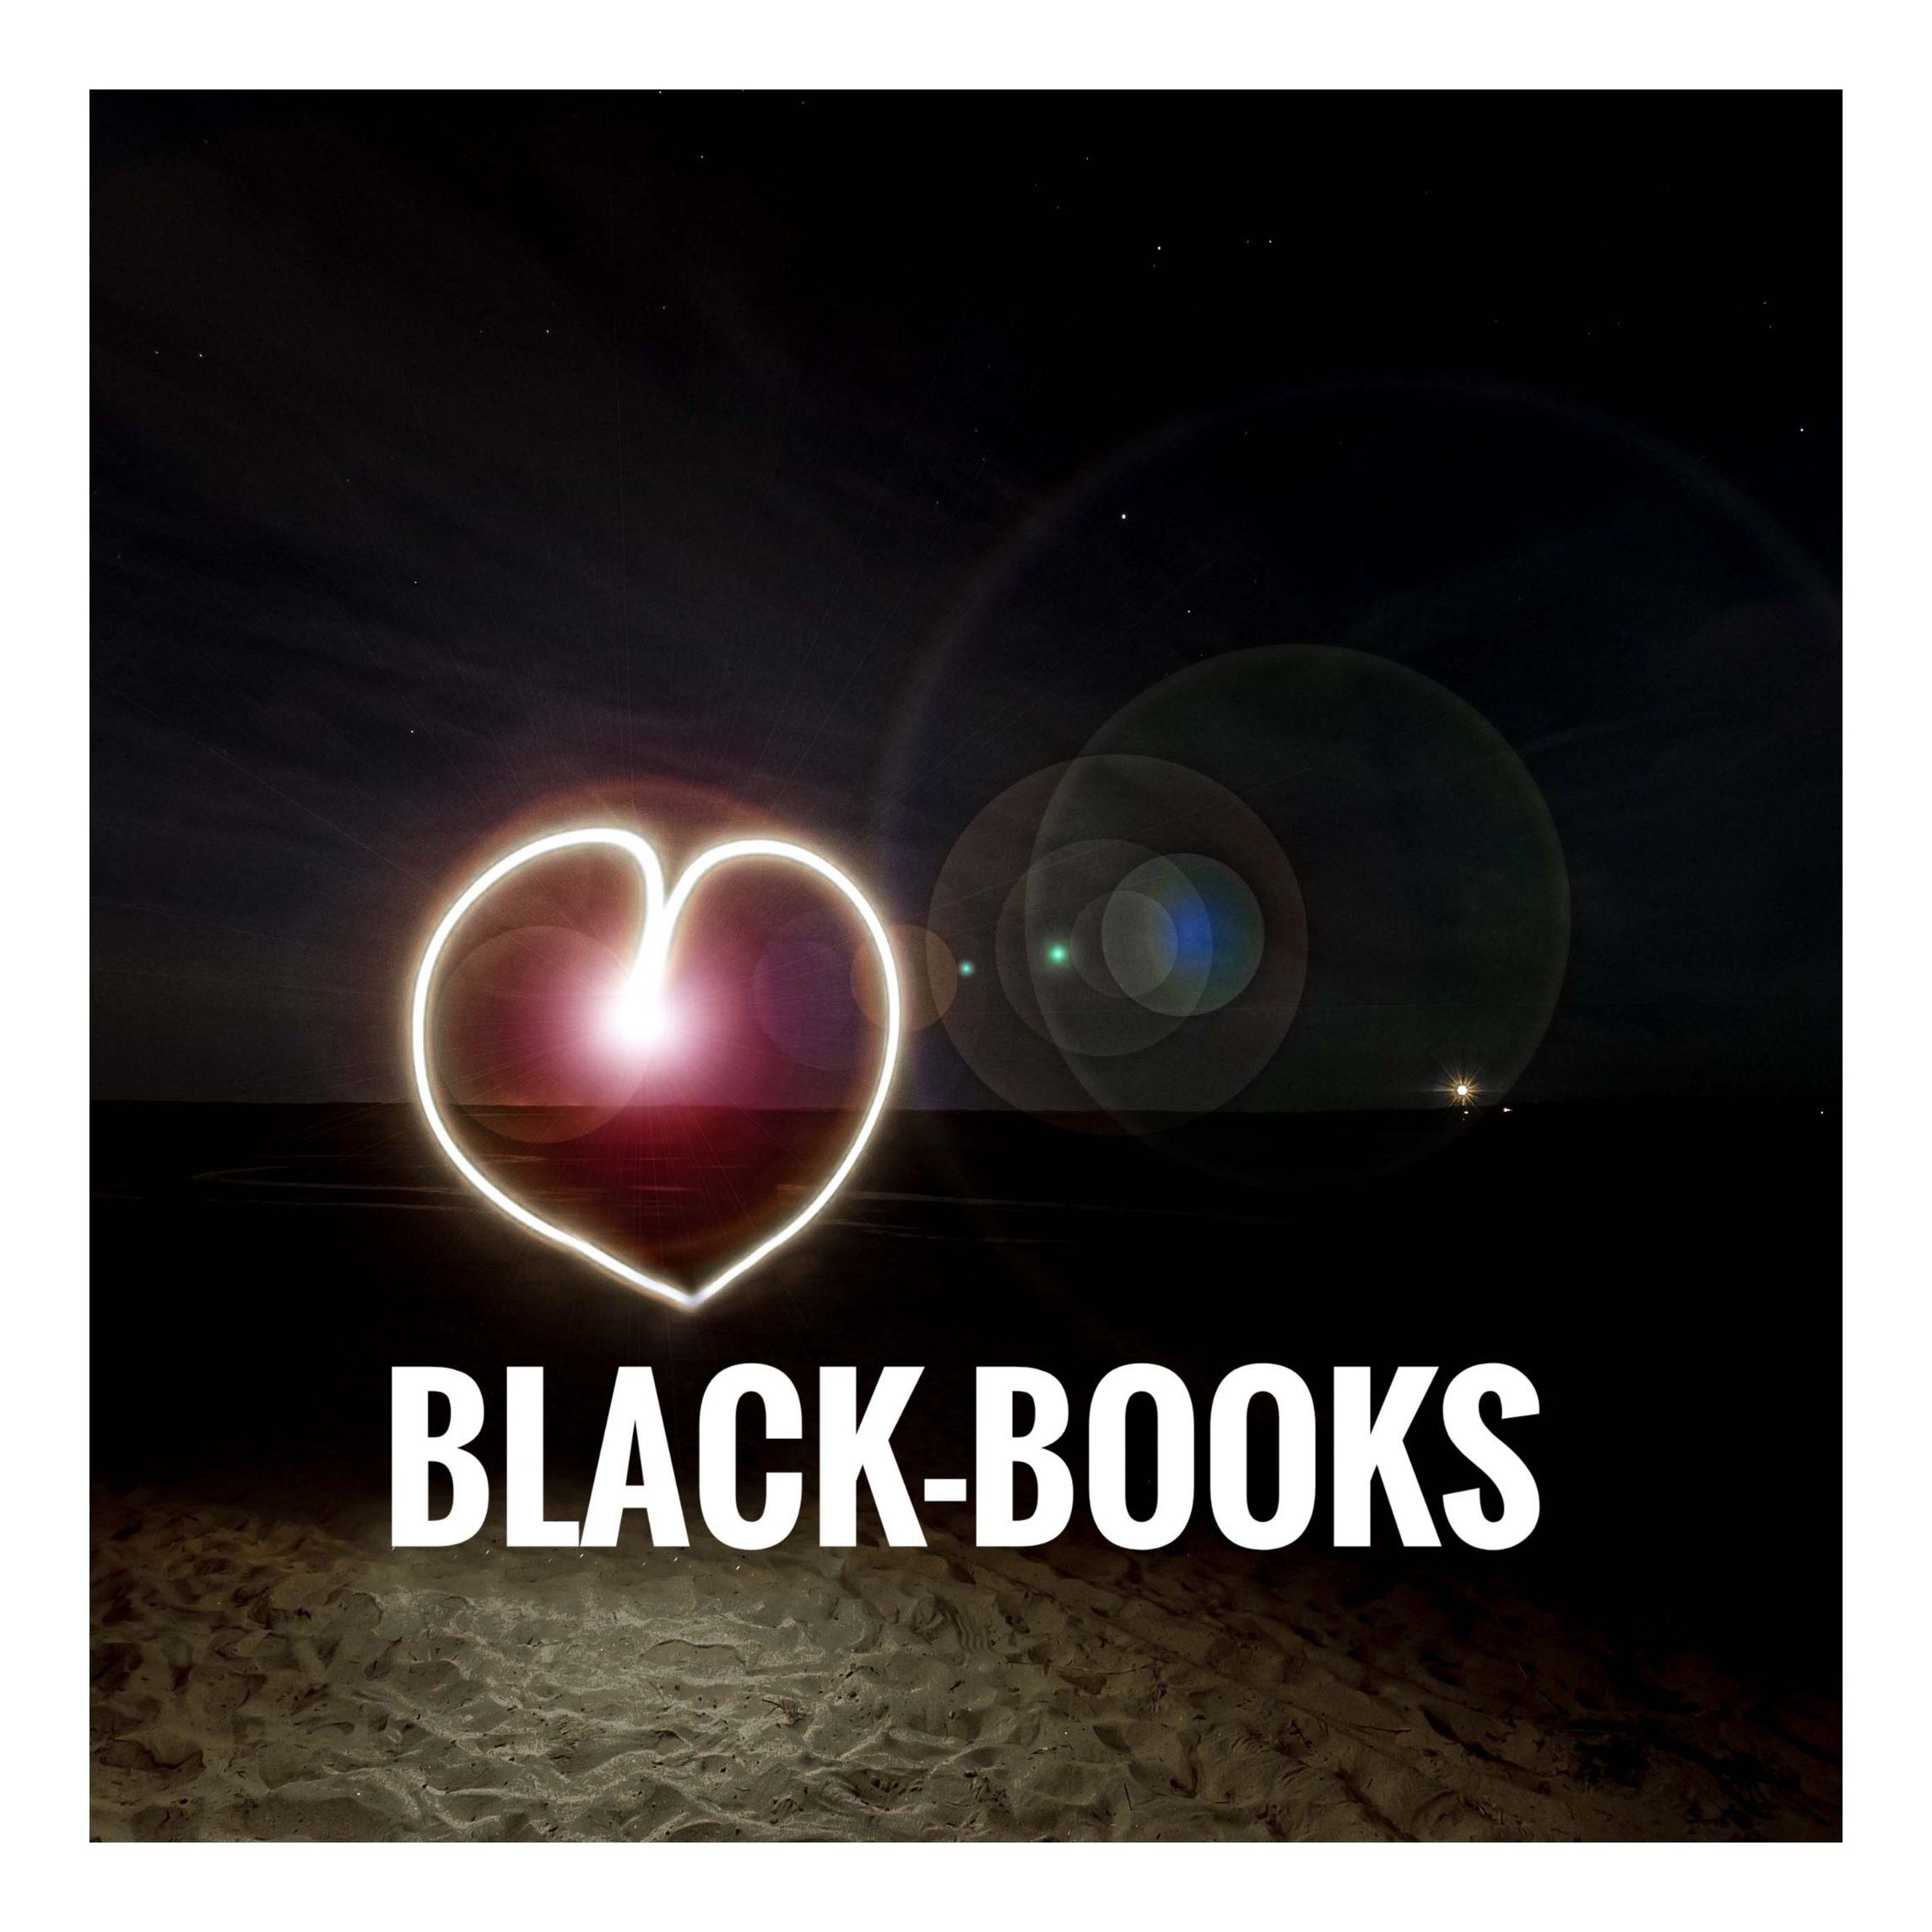 Black-Books